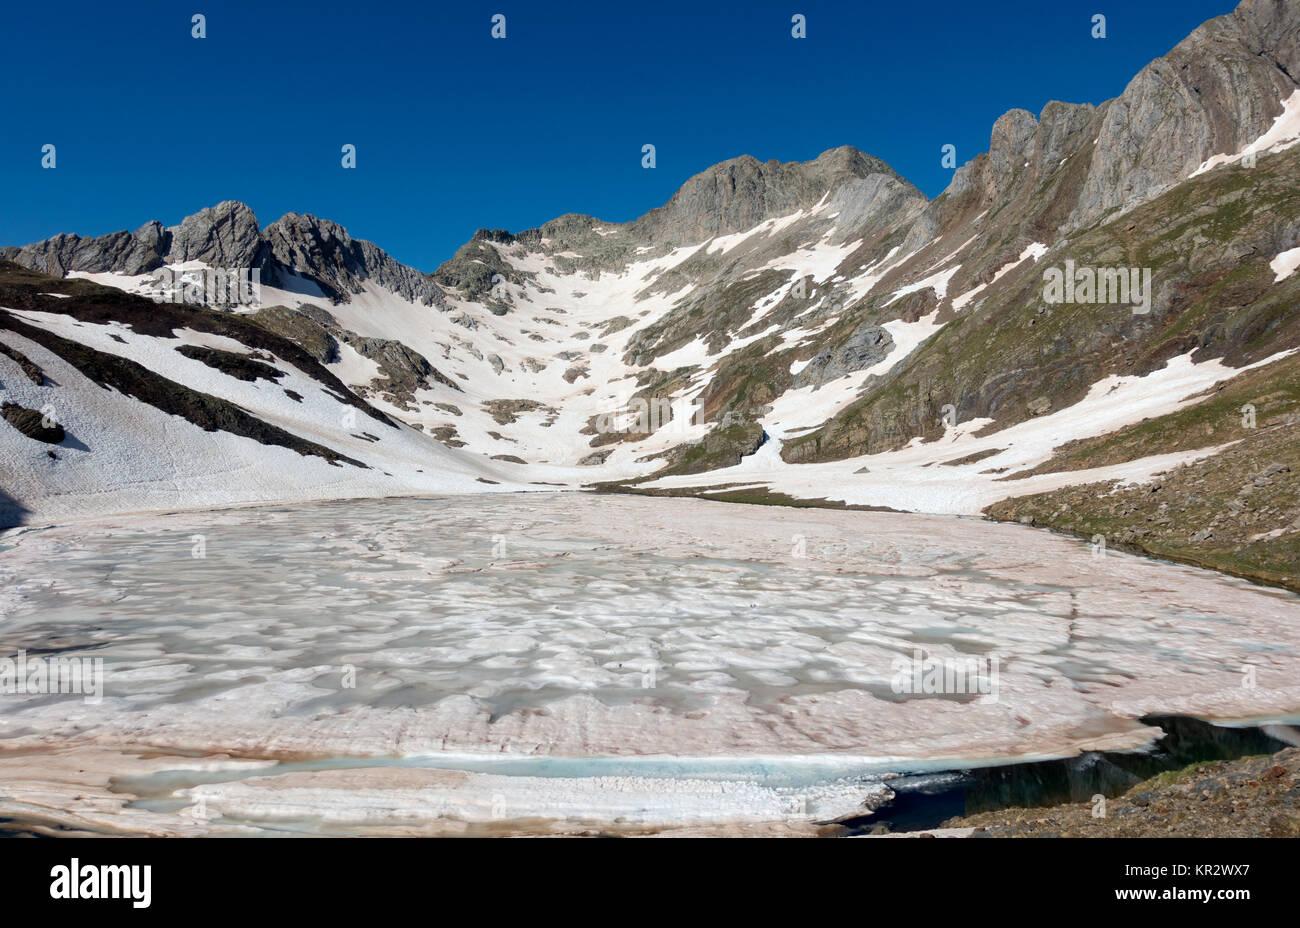 Frozen lake.Posets-Maladeta Natural Park.Pyrenees.Huesca.Spain - Stock Image